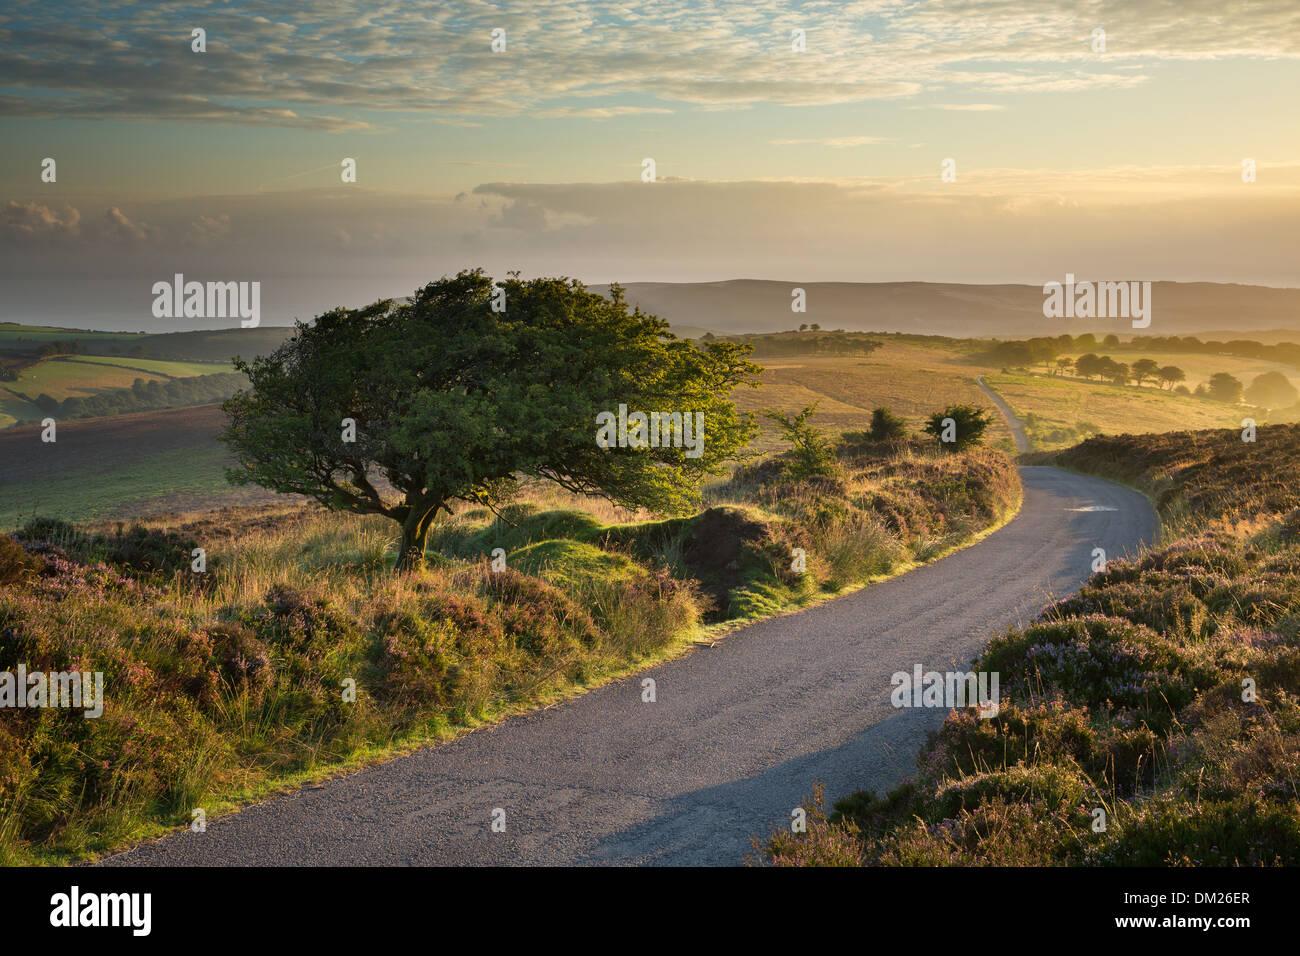 La carretera sobre Stoke pero común, Colina Dunkery Exmoor National Park, Somerset, Inglaterra, Reino Unido. Imagen De Stock